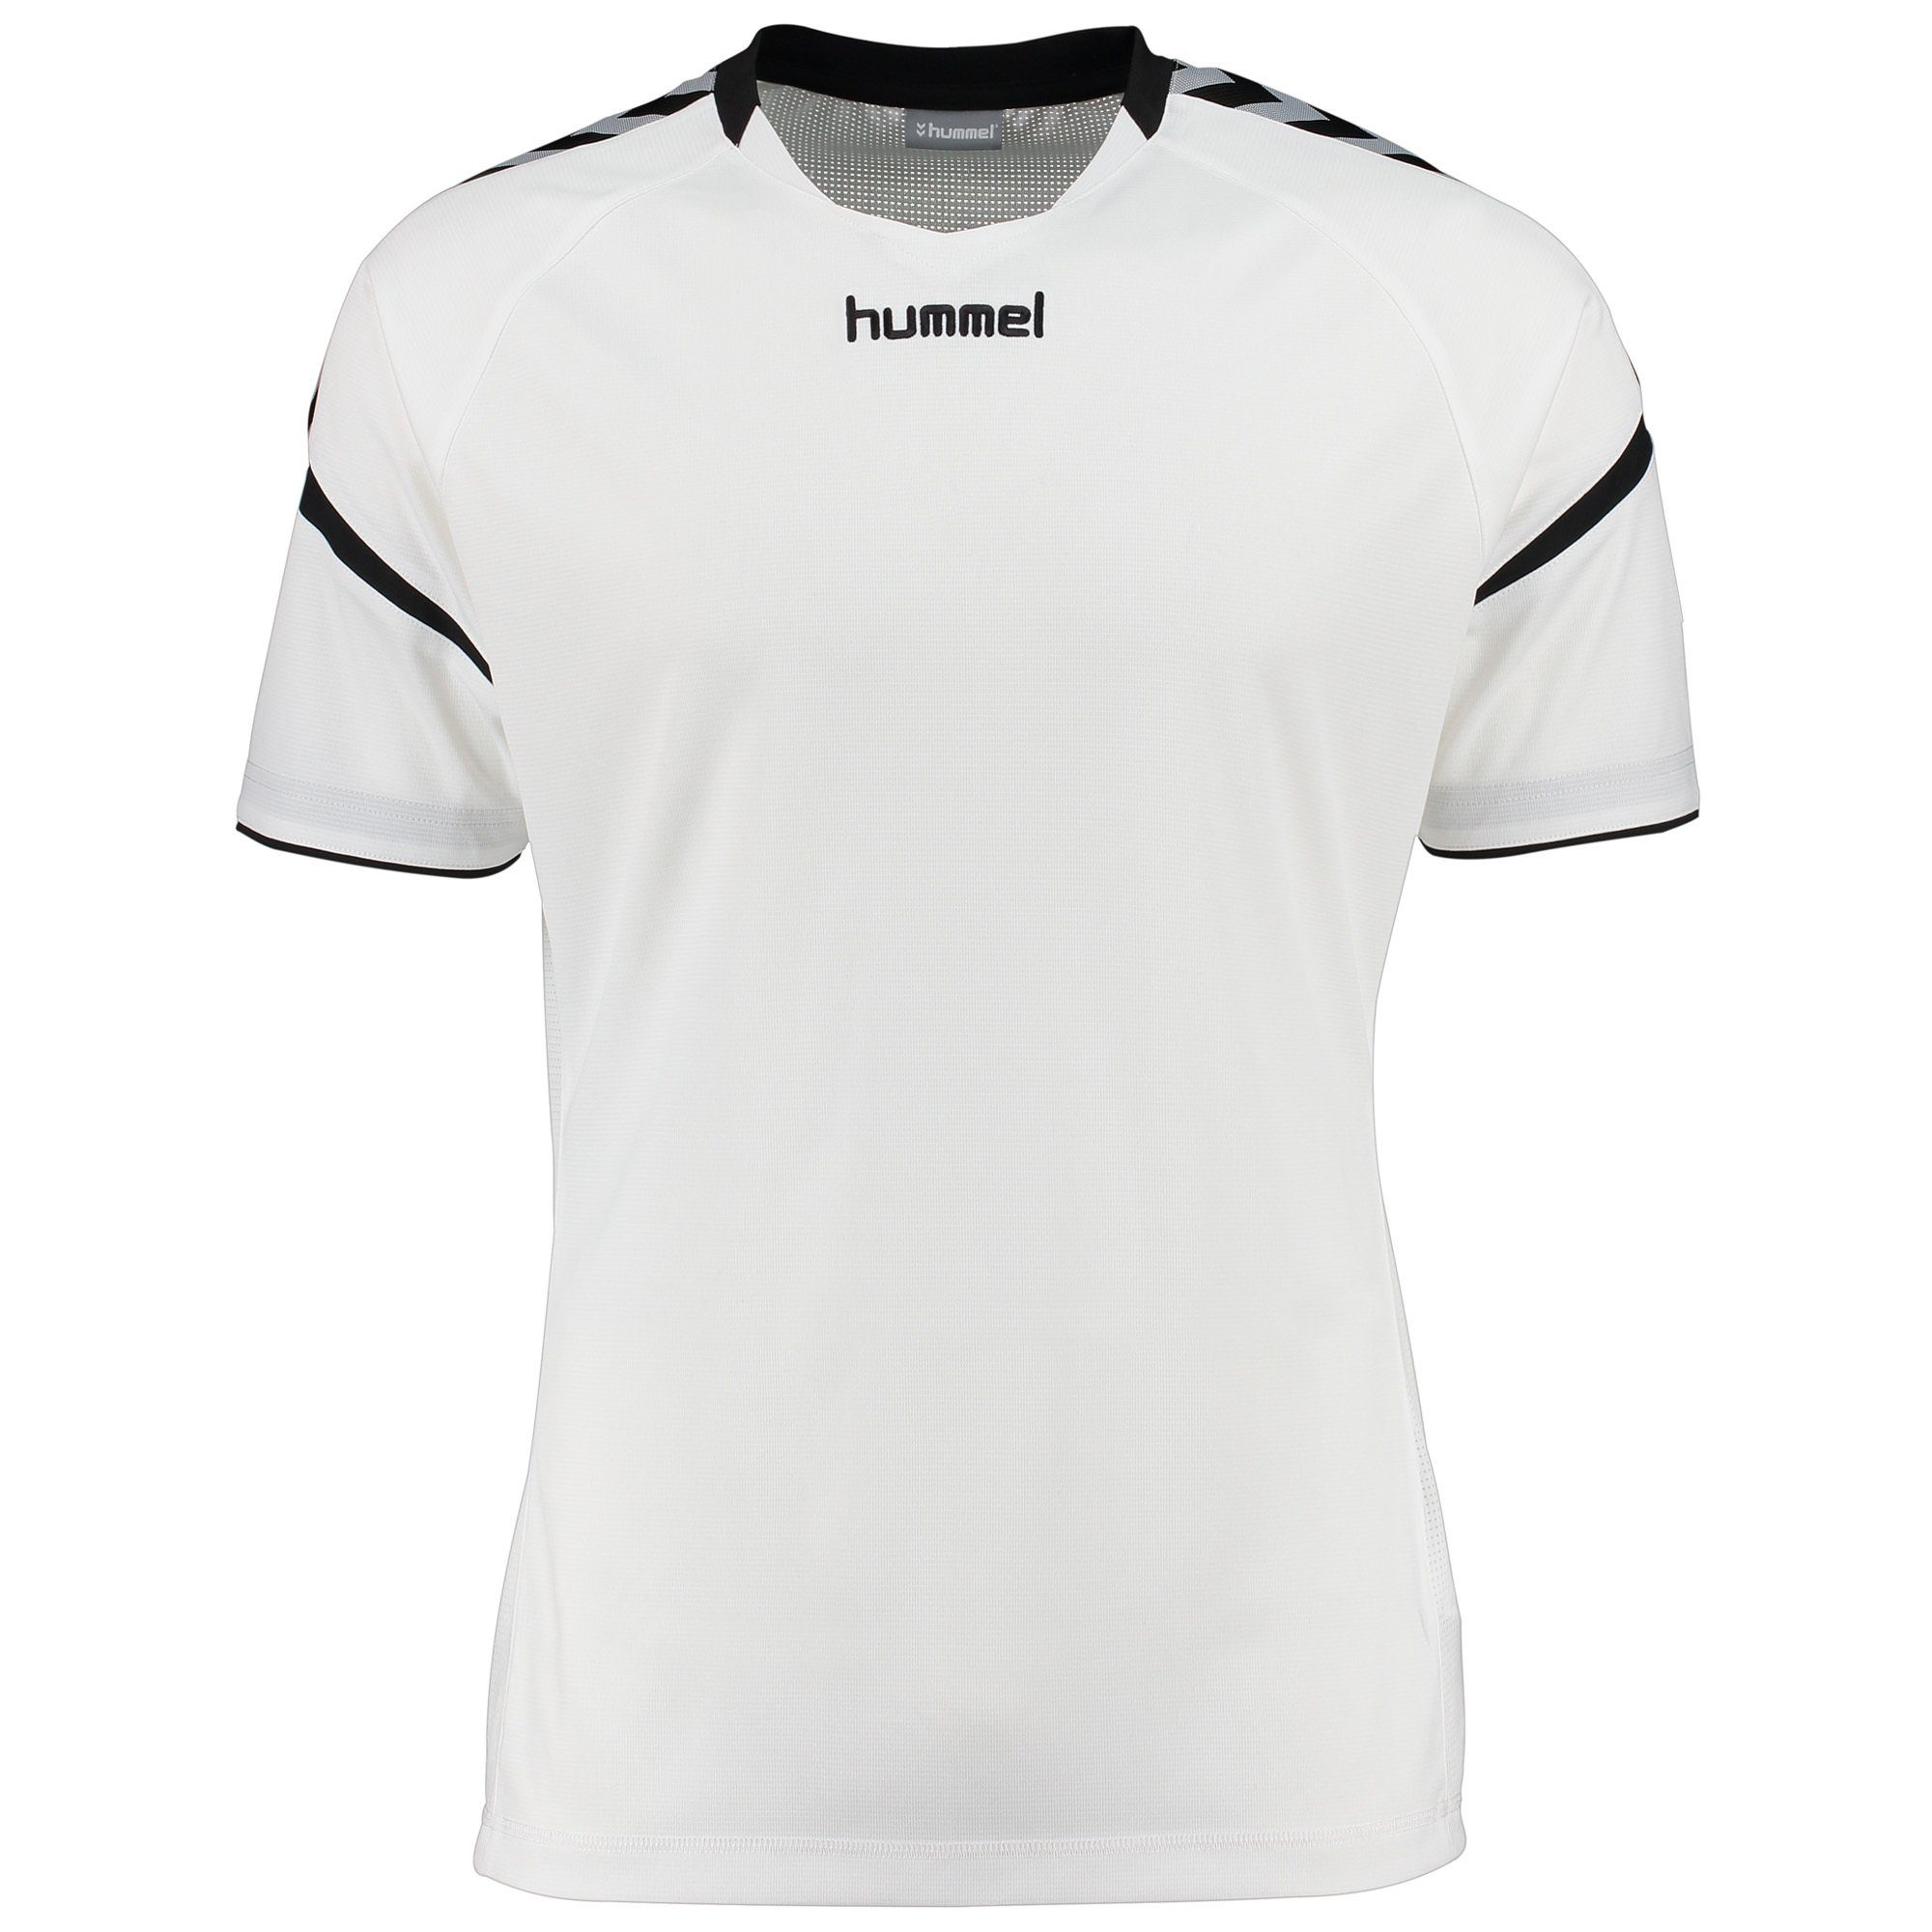 hummel Handballtrikot Authentic Charge | Sportbekleidung > Trikots | Weiß | Jersey - Trikot | Hummel